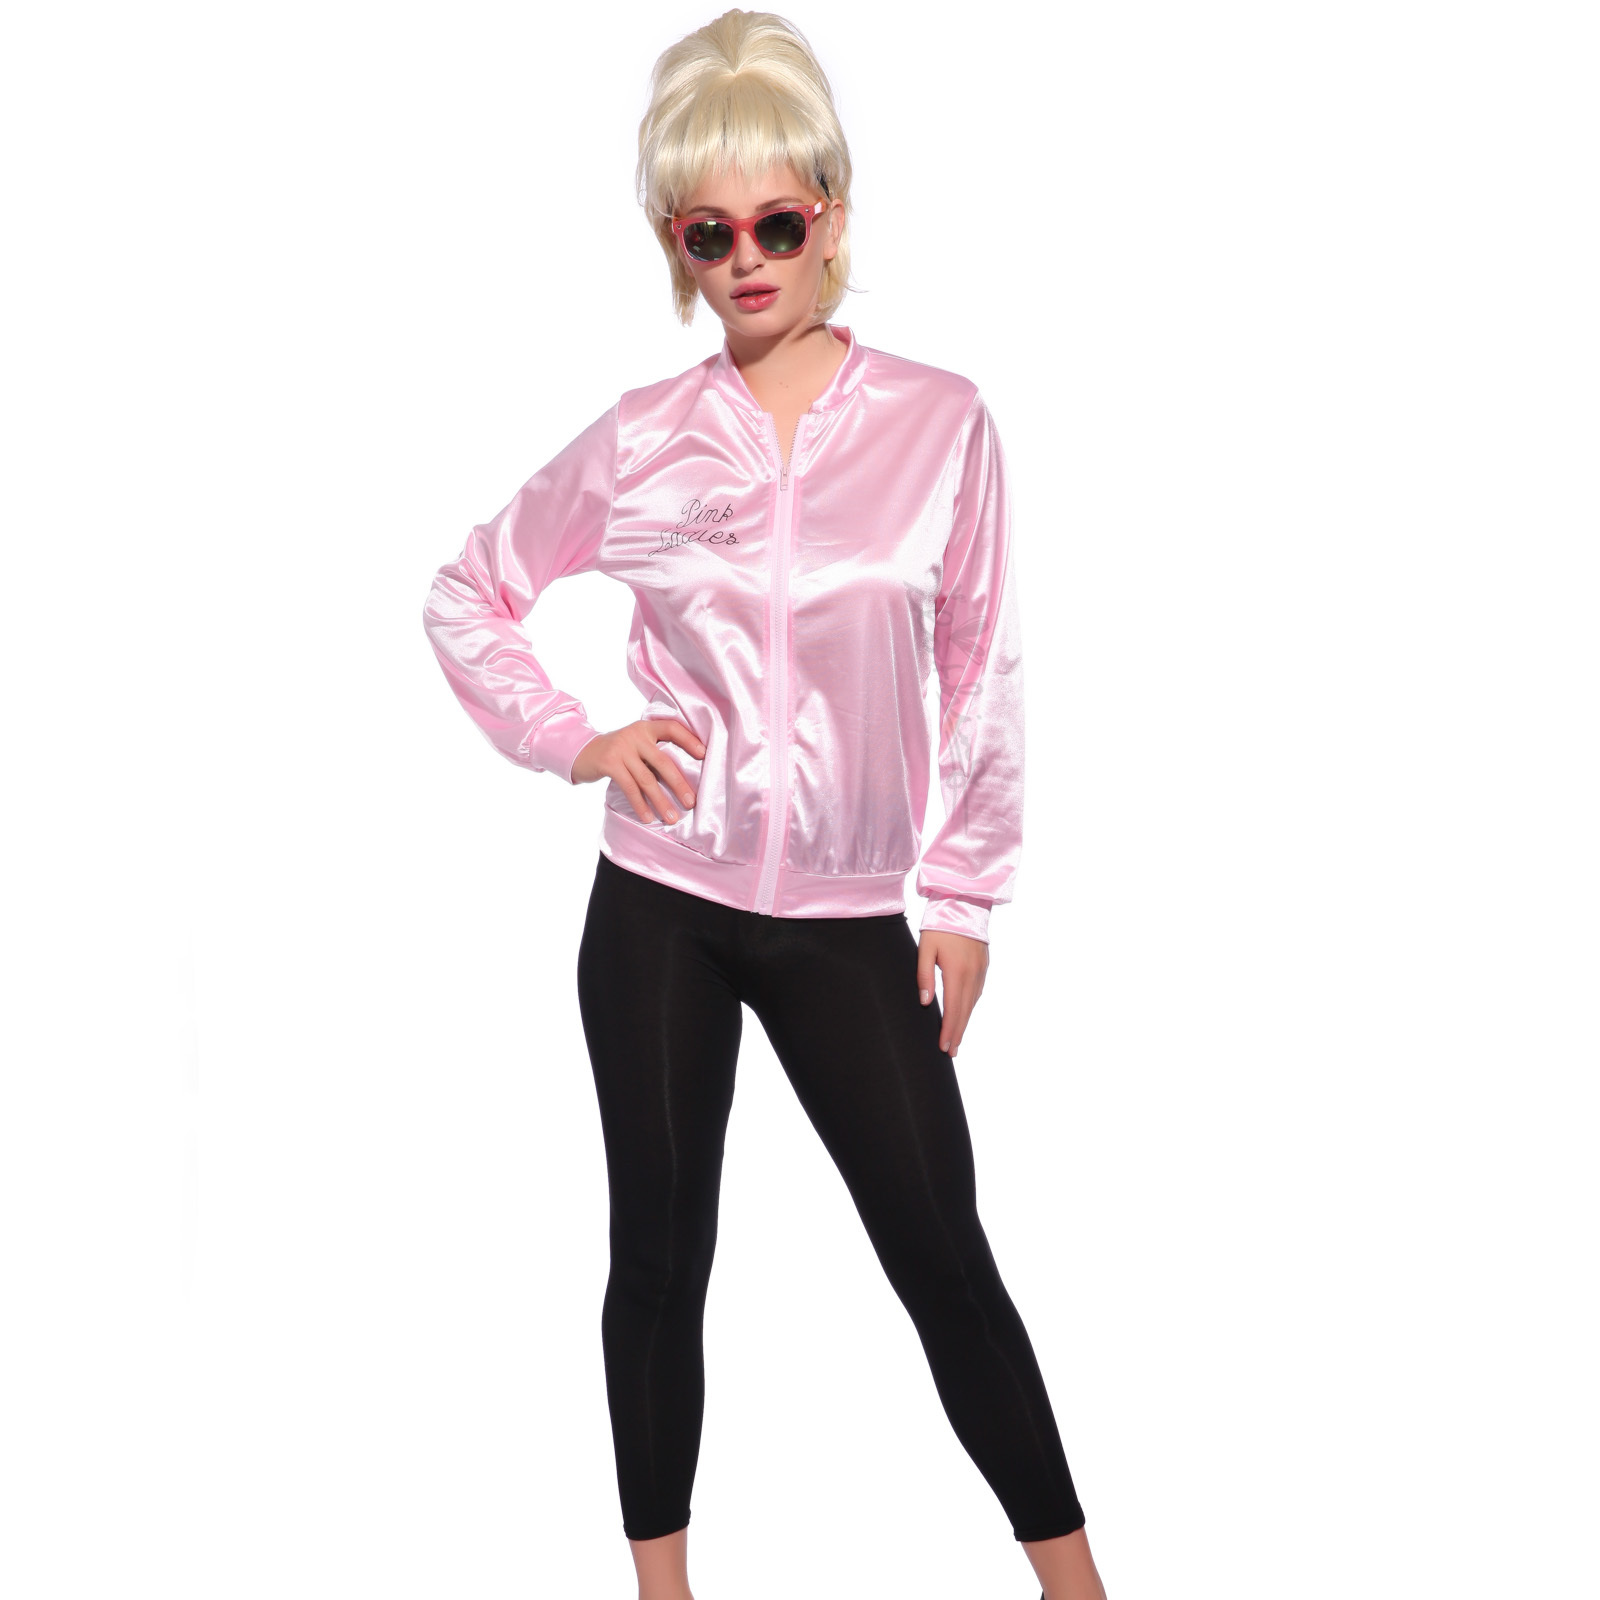 Retro 1950s Classic Movie Satin Pink Ladies Jacket Costume